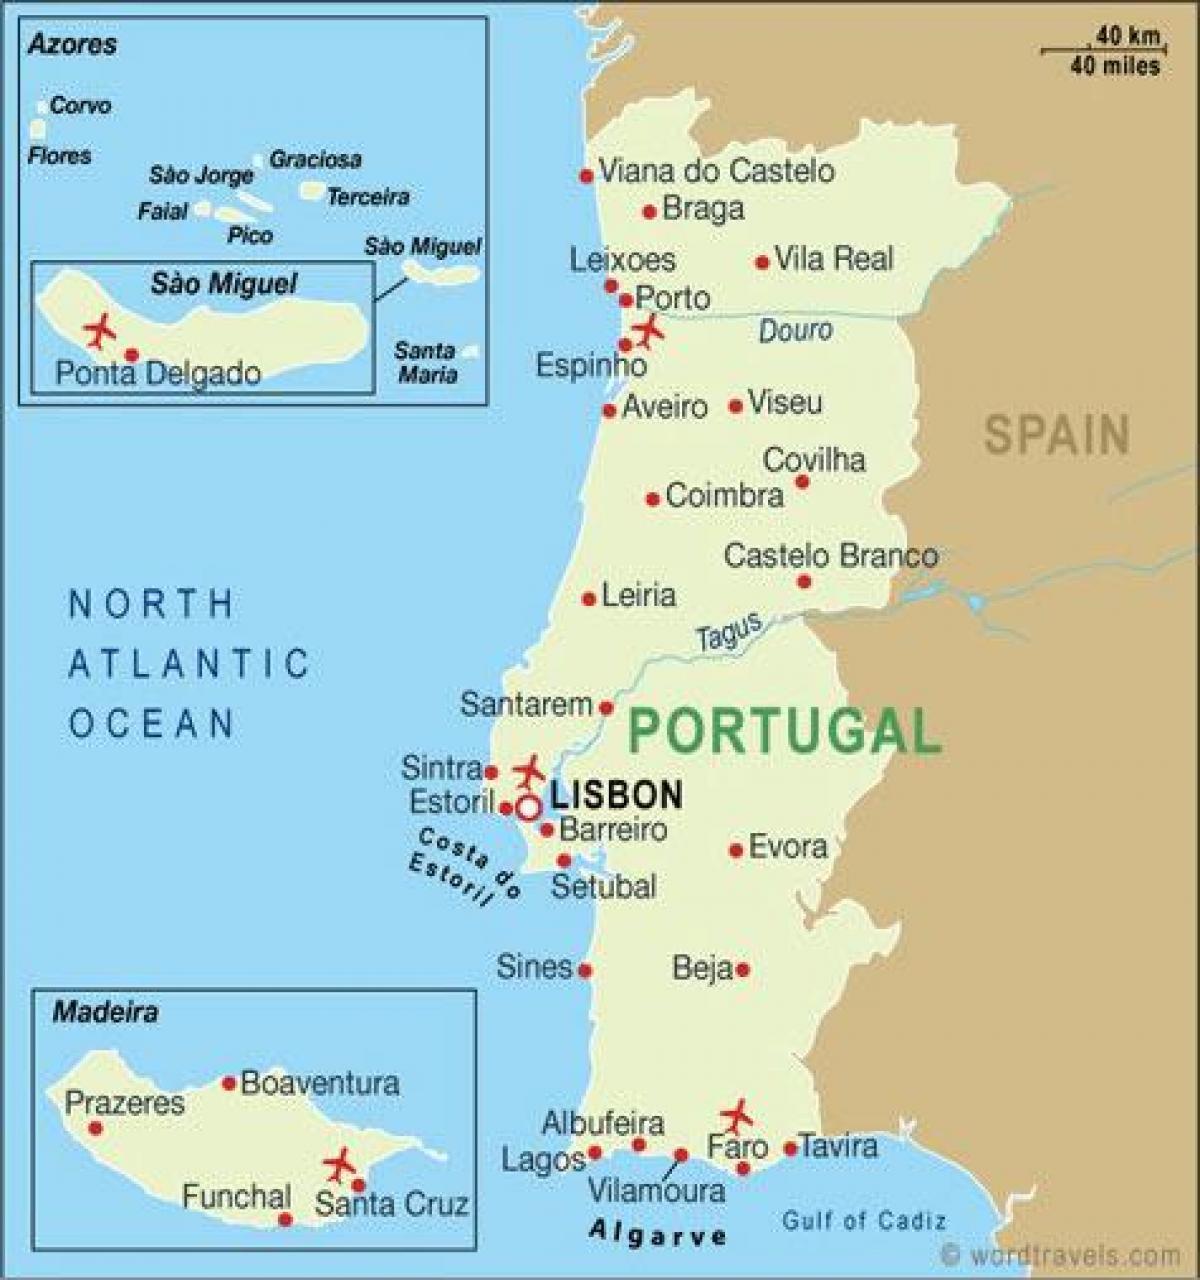 mapa aeroportos portugal Portugal aeroportos mapa   Mapa dos aeroportos de Portugal (Europa  mapa aeroportos portugal